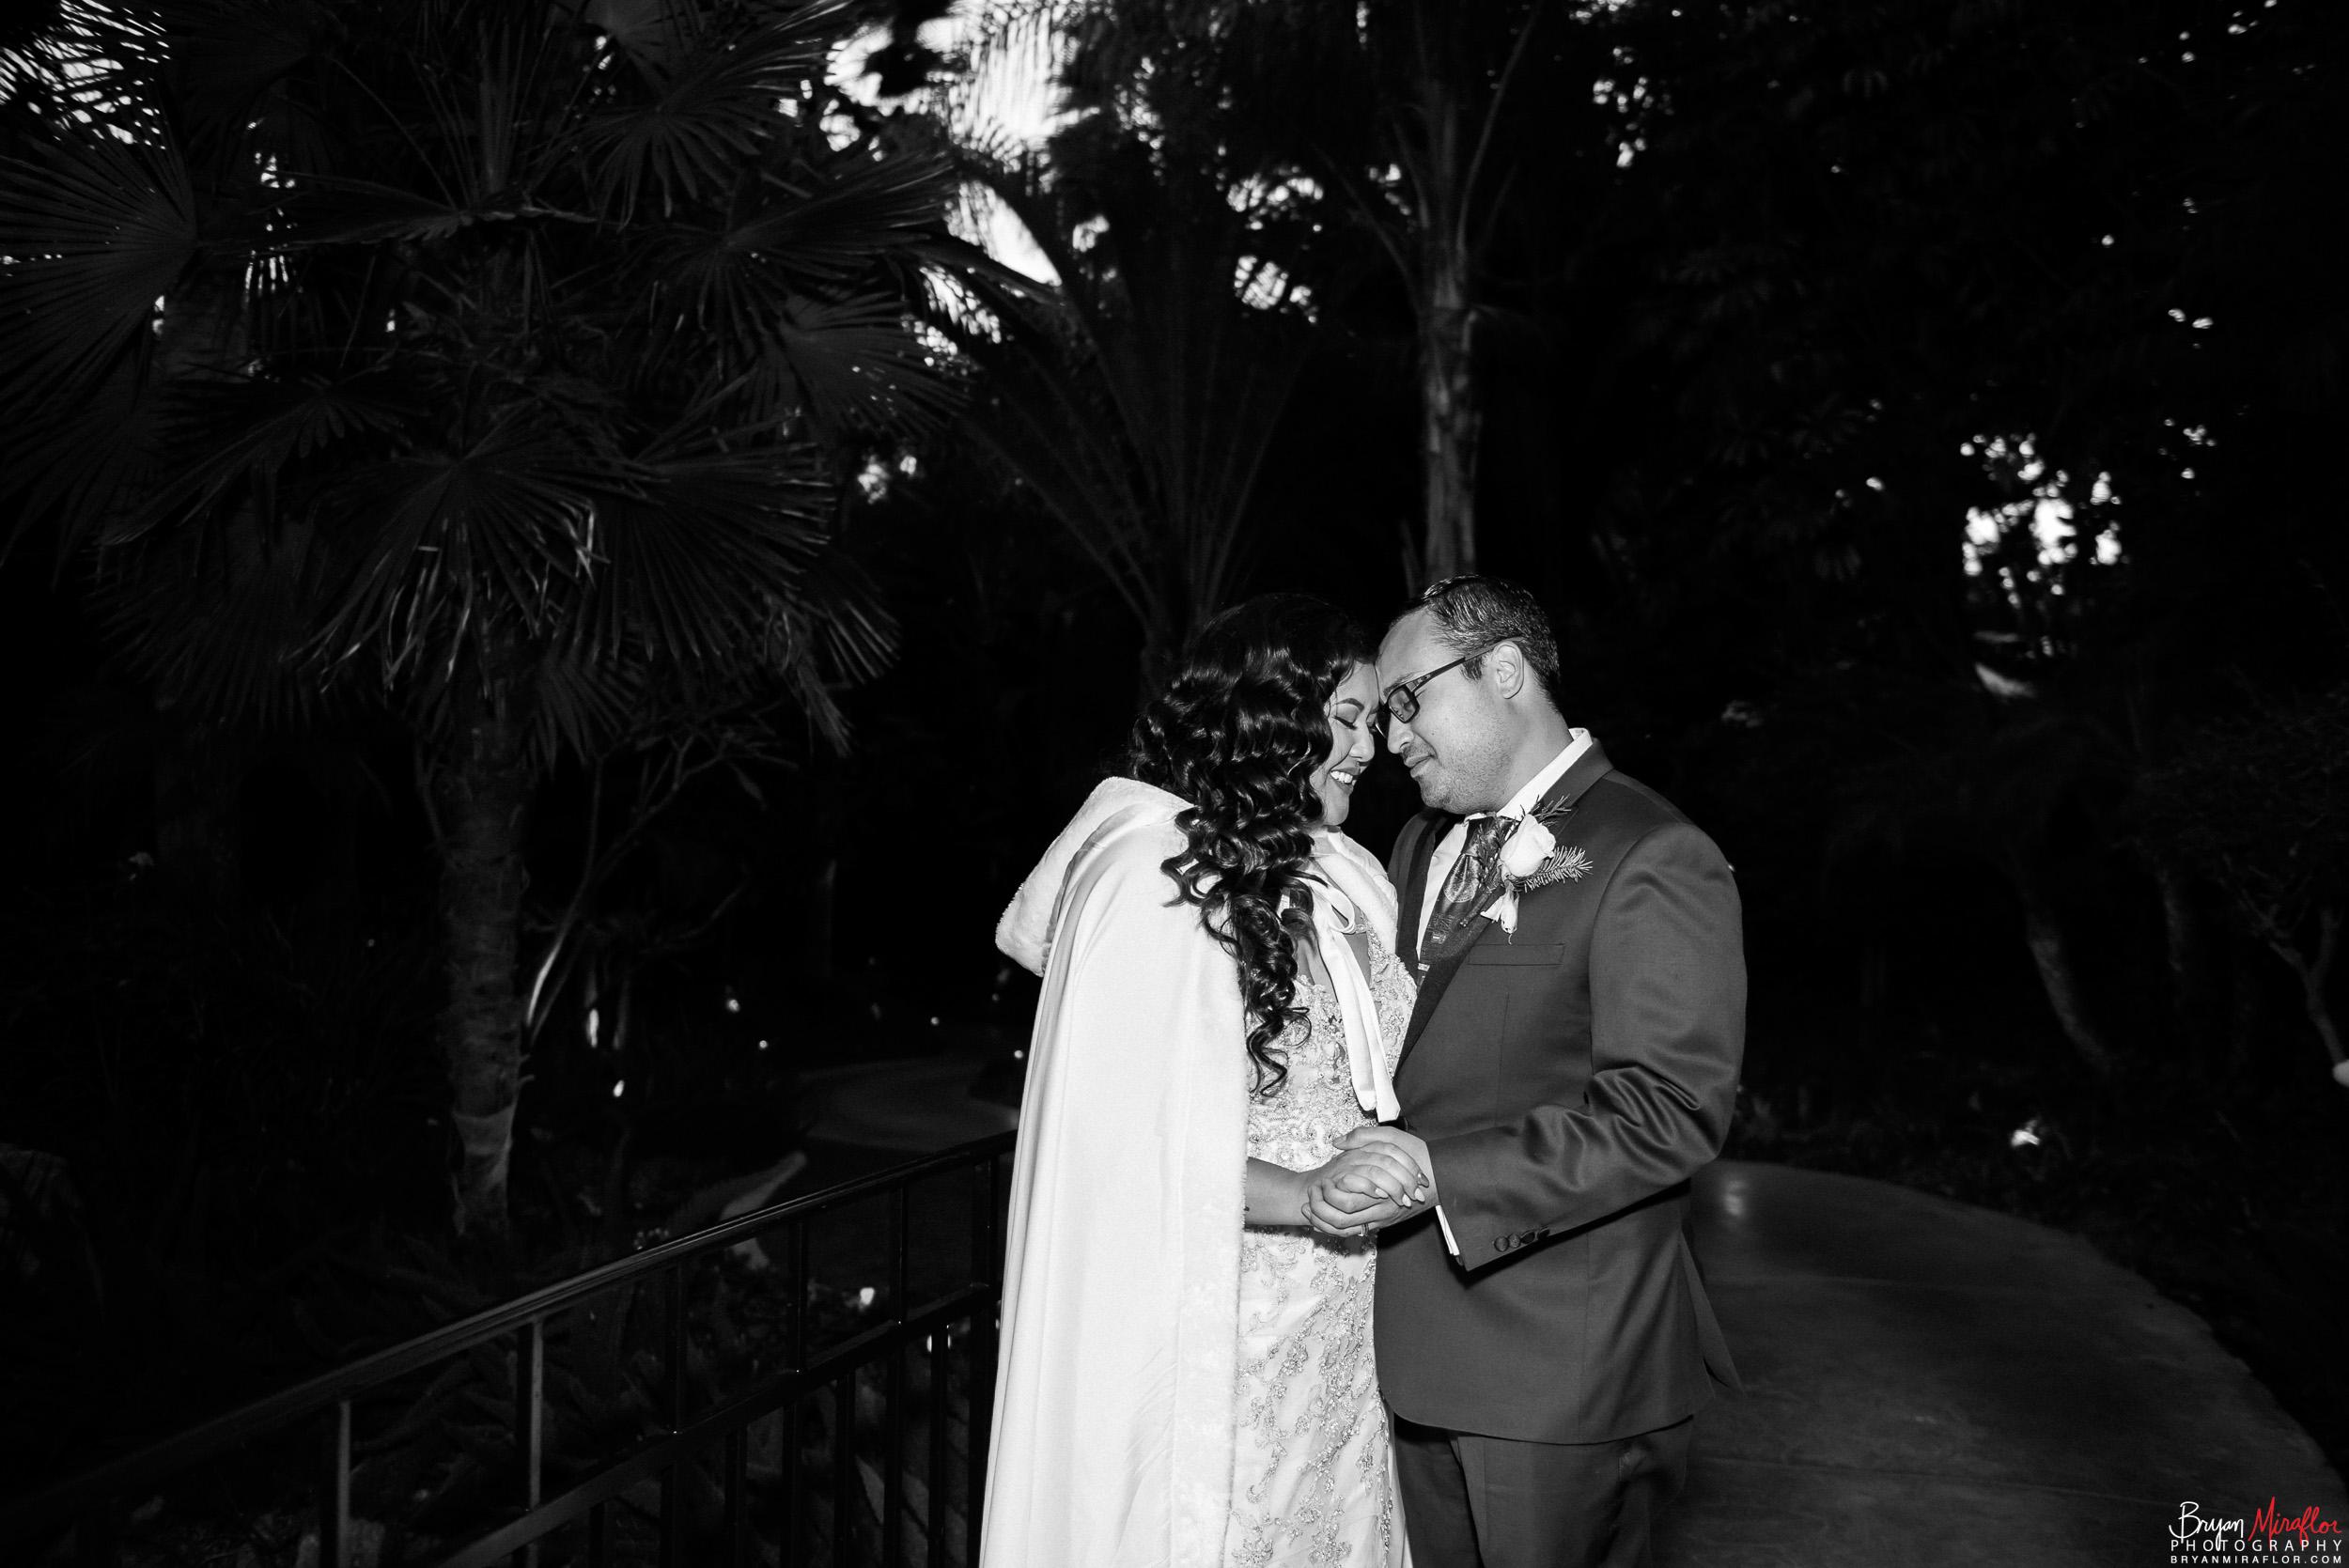 Bryan-Miraflor-Photography-Hannah-Jonathan-Married-Grand-Traditions-Estate-Gardens-Fallbrook-20171222-006.jpg